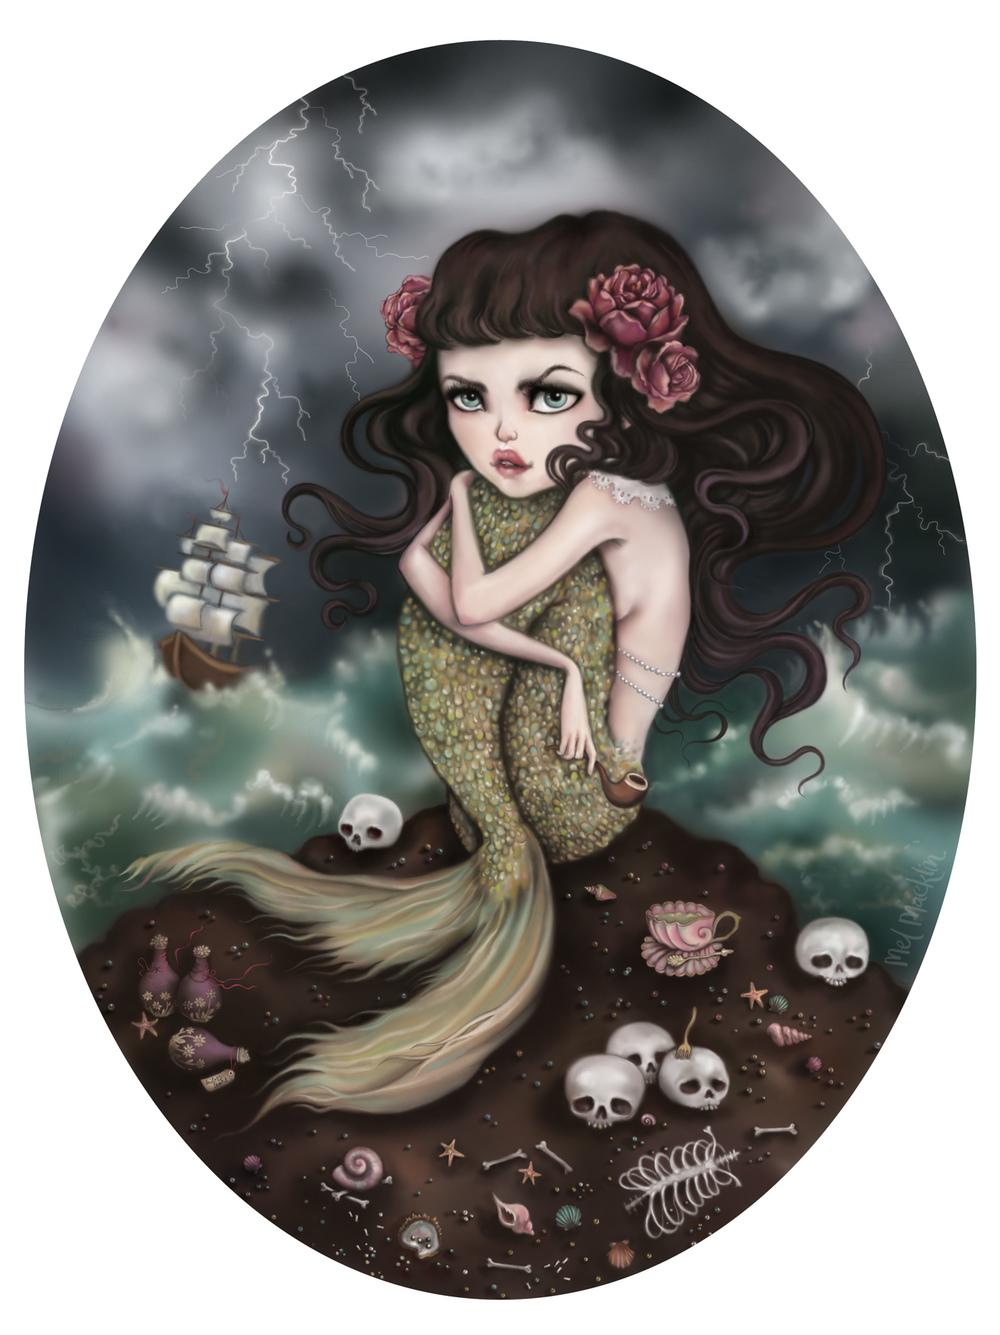 Salty Tears and Shipwrecks by Mel Macklin